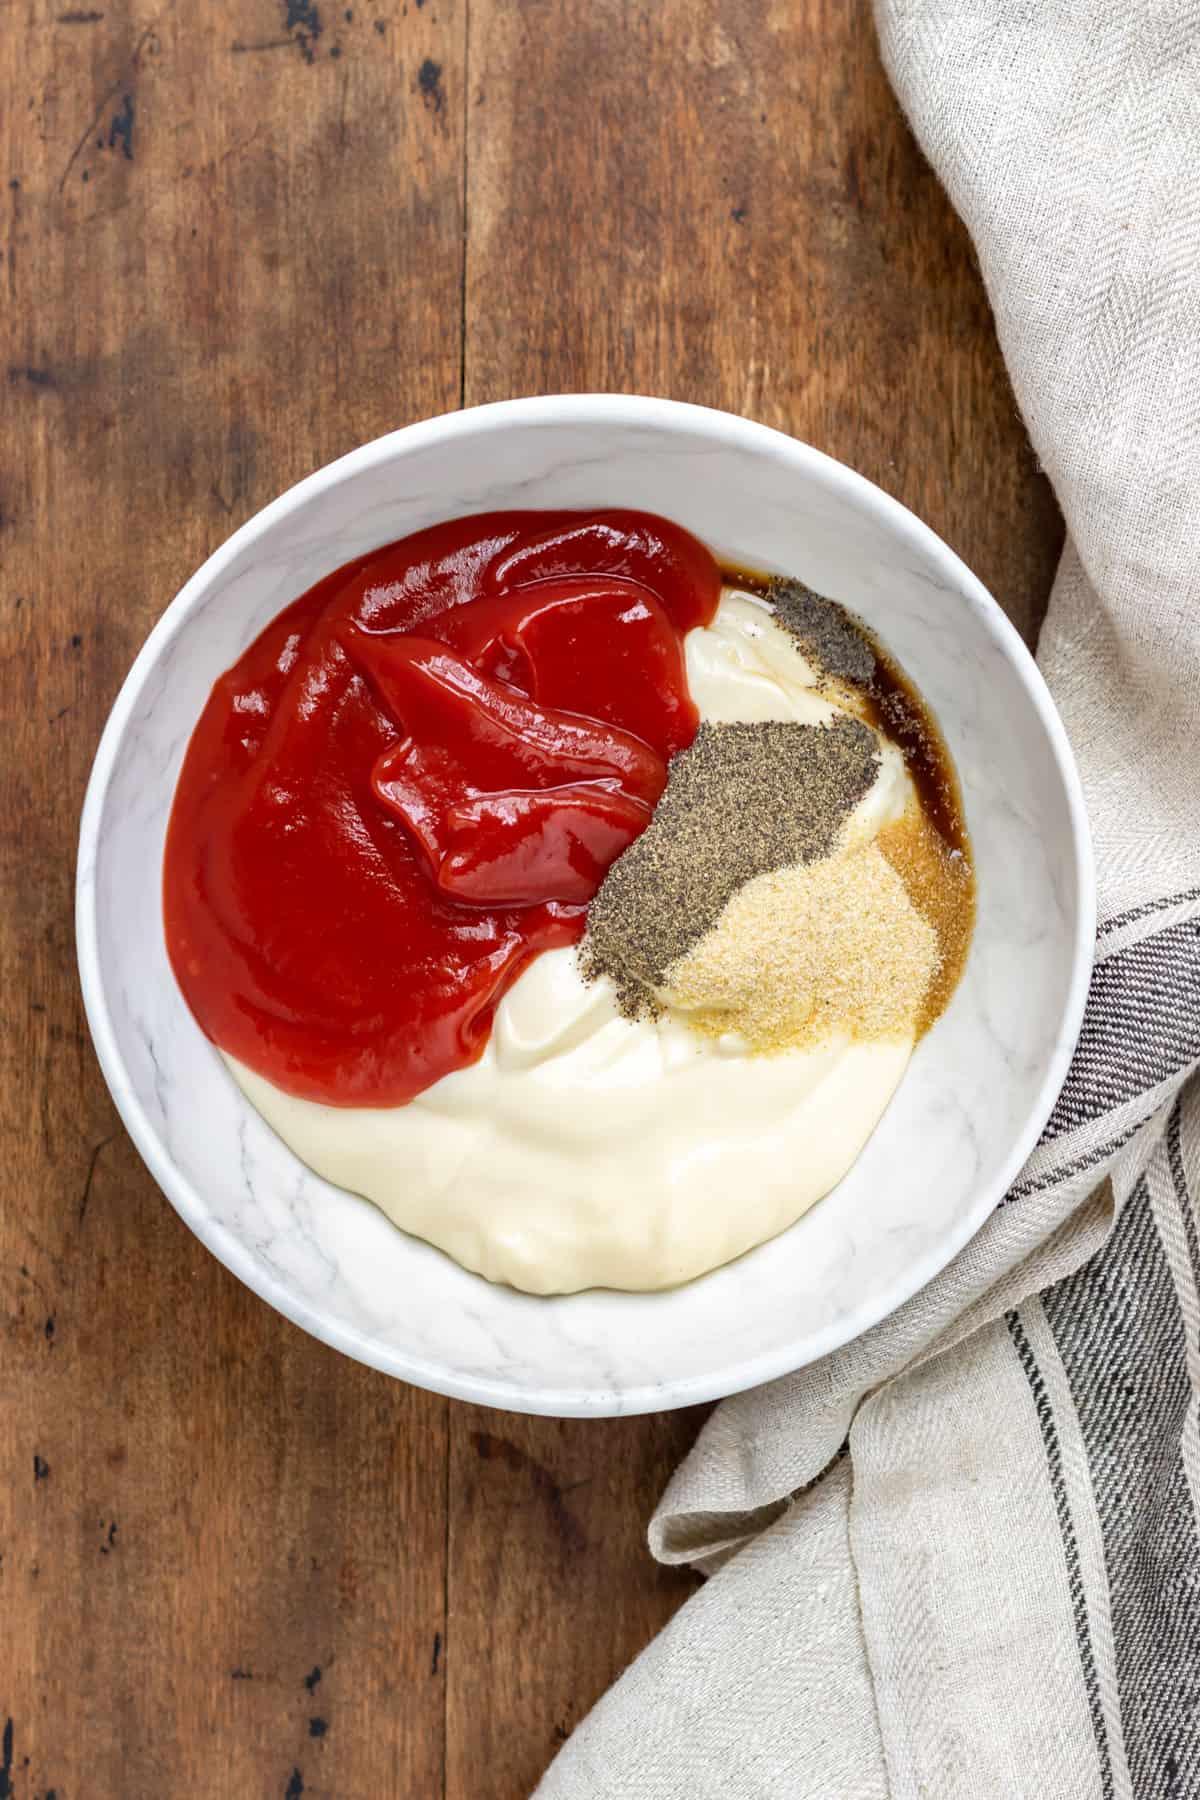 Bowl of mayo, ketchup, garlic powder, vinegar, worcestershire sauce and pepper.